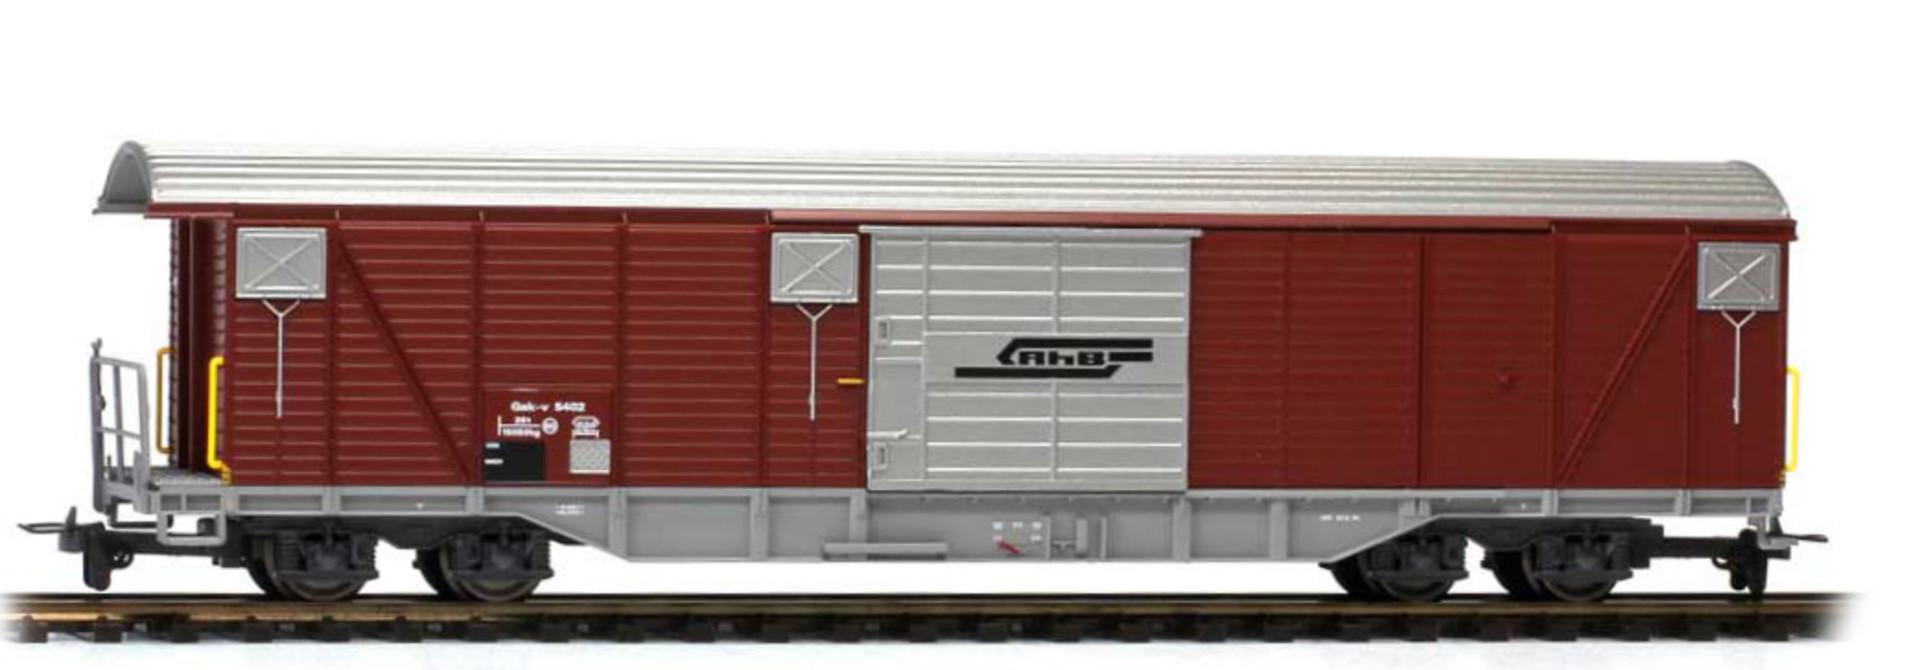 2278172 RhB Gak-v 5402 Großraumgüterwagen